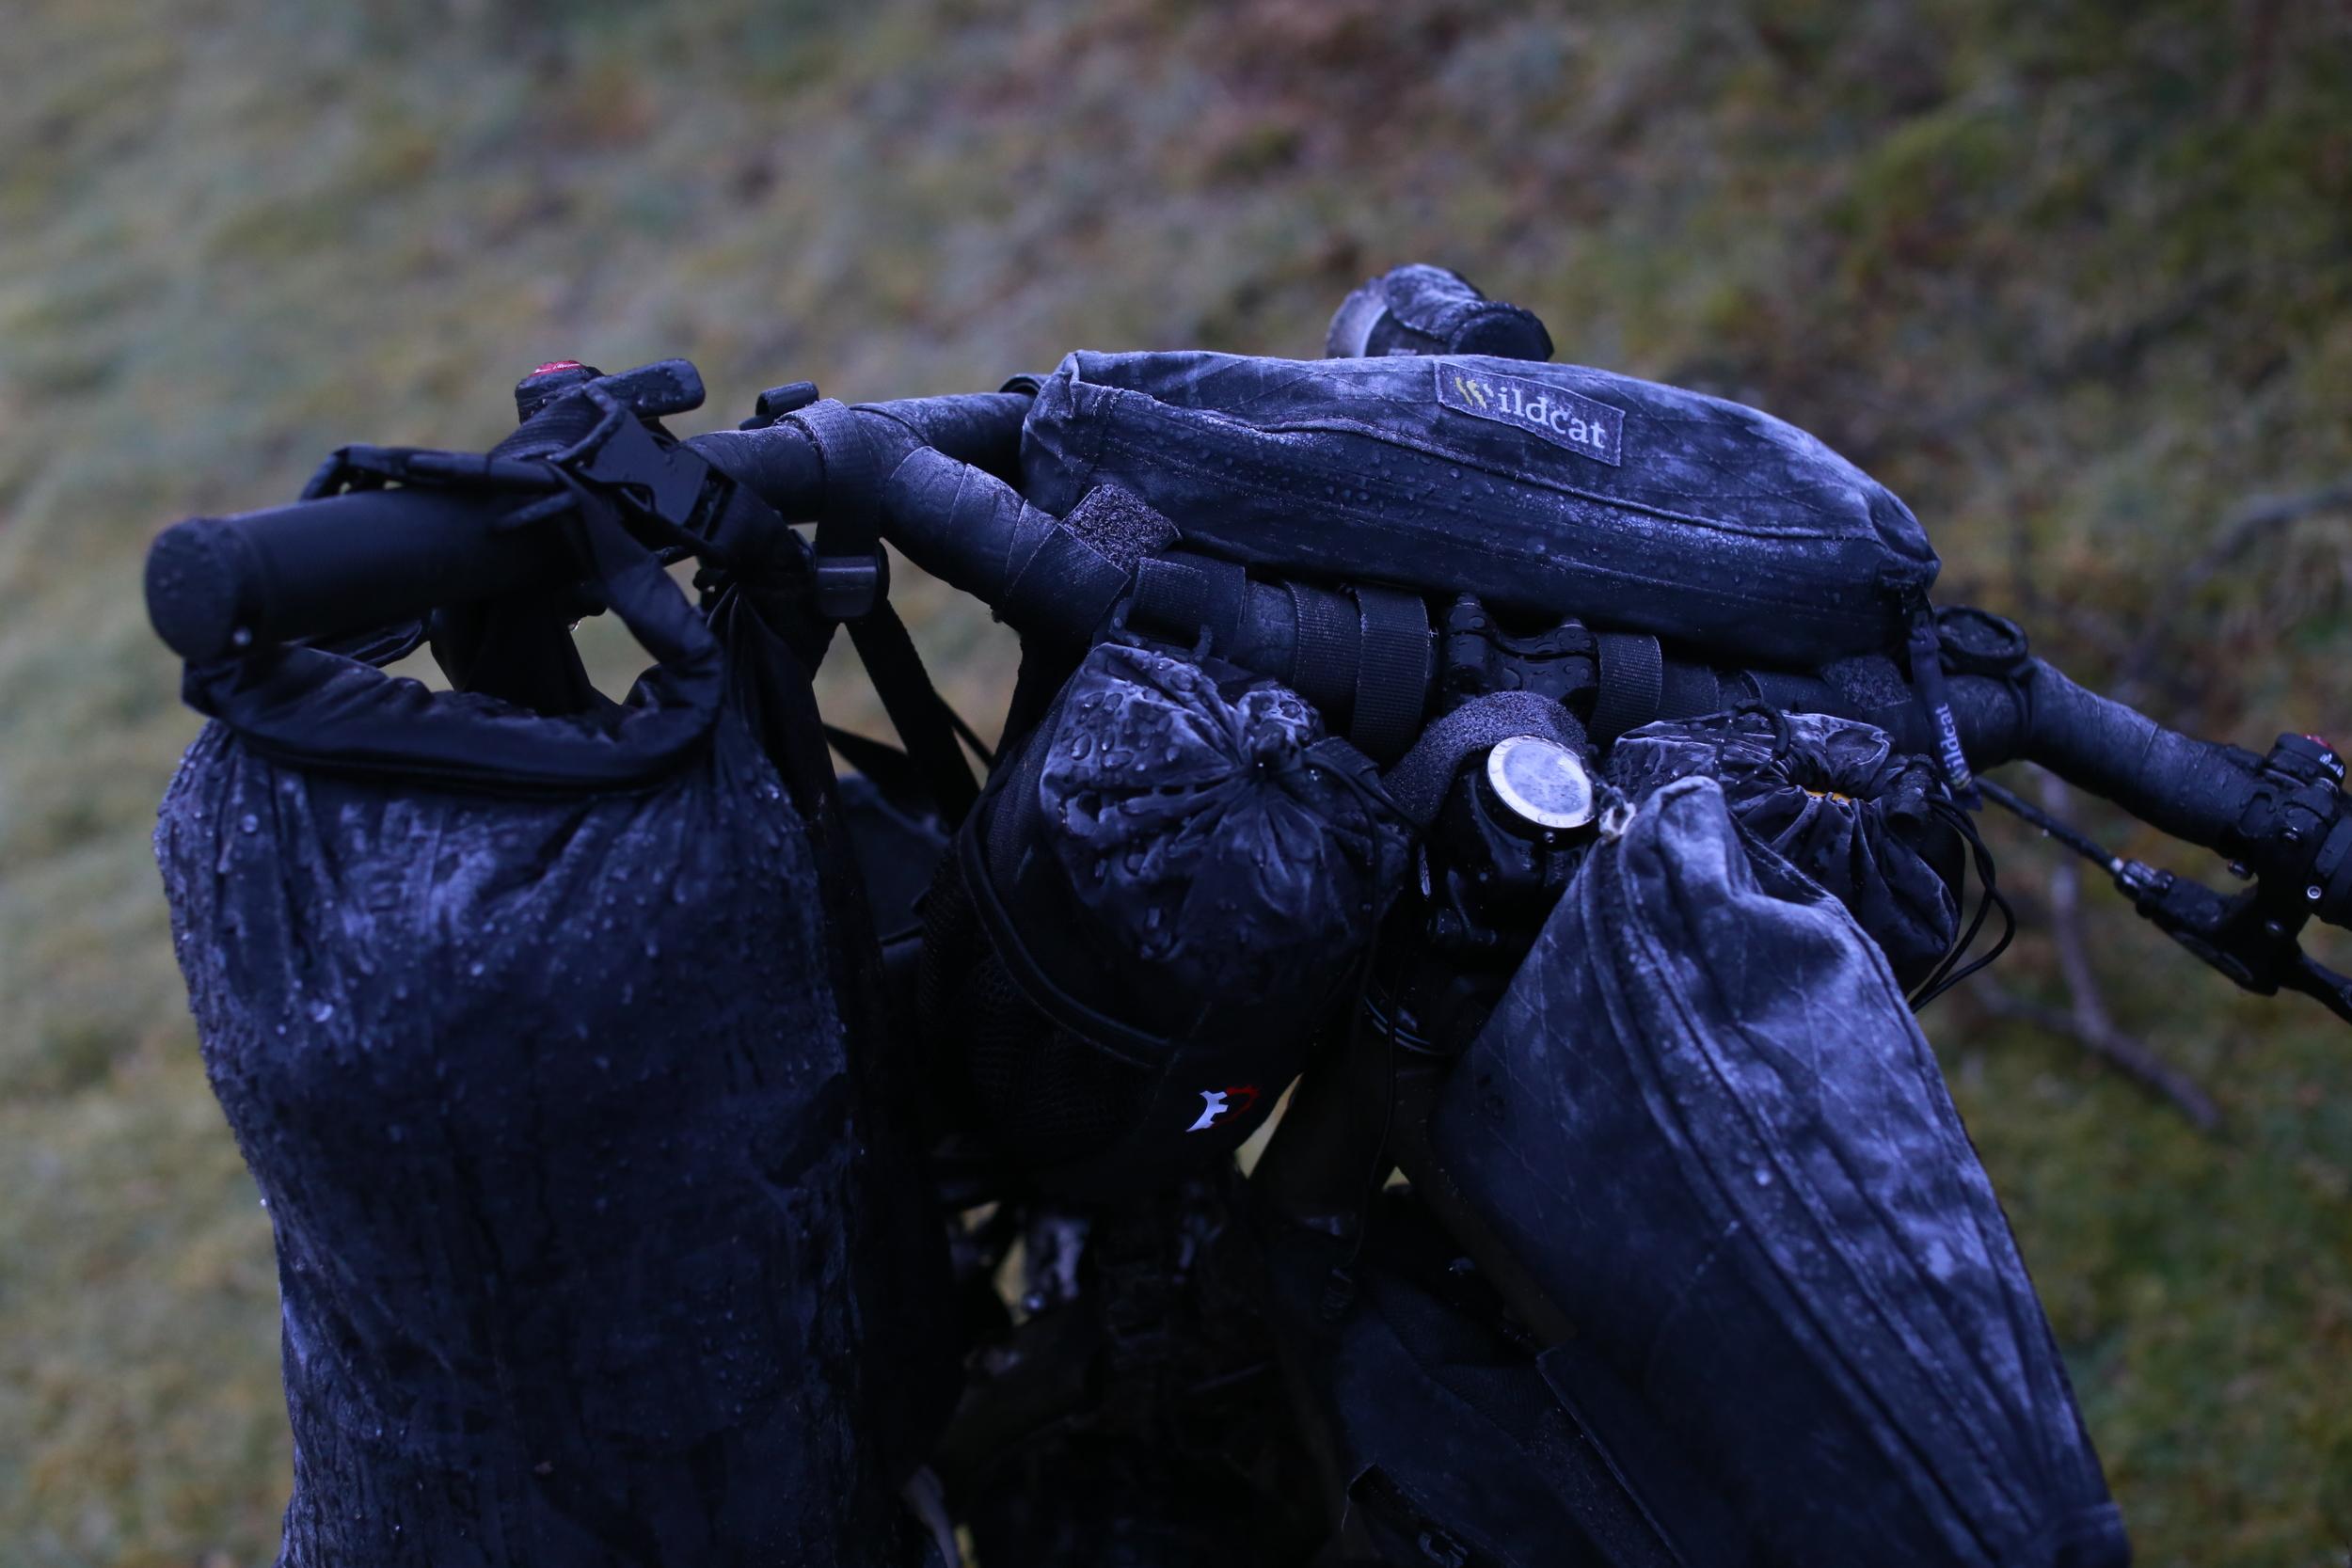 wildcat, wildcat gear, bikepacking bags, revelate designs, bikepacking harness, bikepacking bags, stem captain, snug pak, snugpak dri sak, dry sacks, bicycle touring apocalypse, surly, surly ecr, photography, freezing, bikepacking blog, cycling gear, bikepacking gear, travel blog